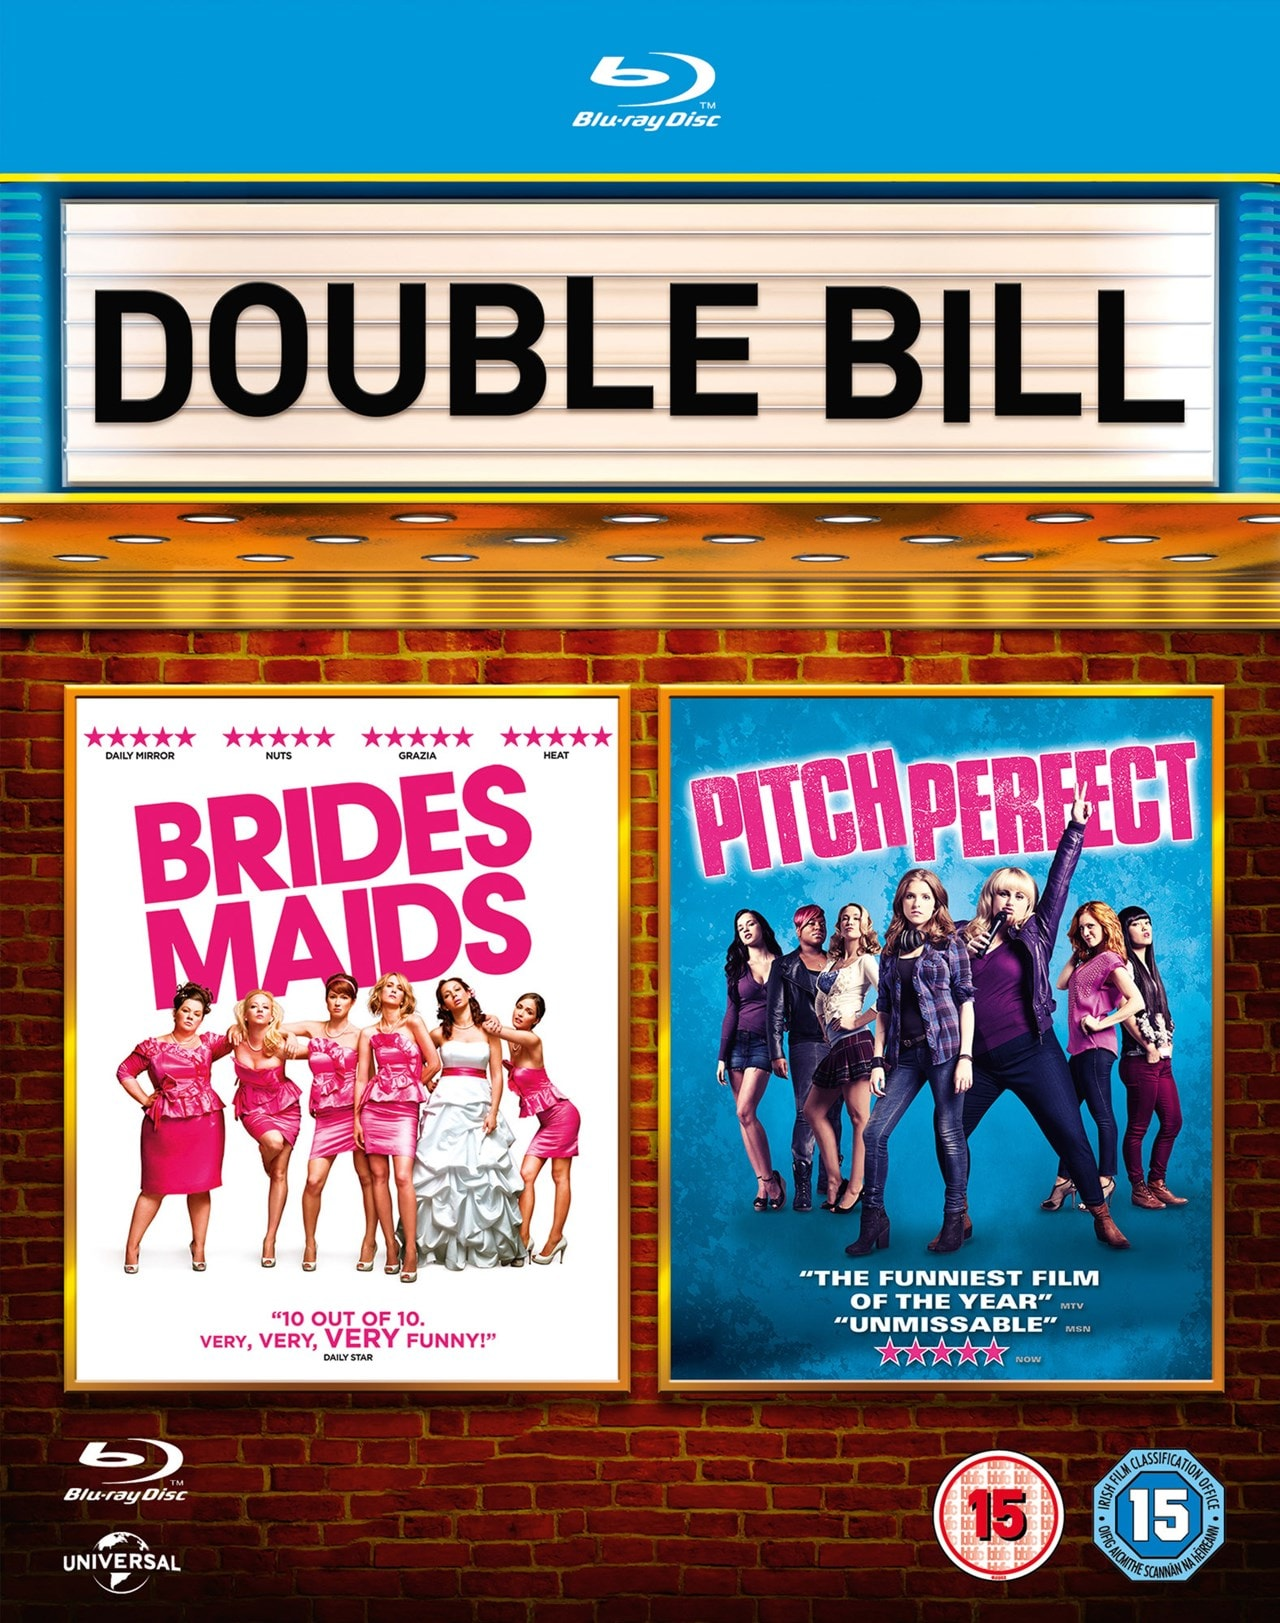 Bridesmaids/Pitch Perfect - 1